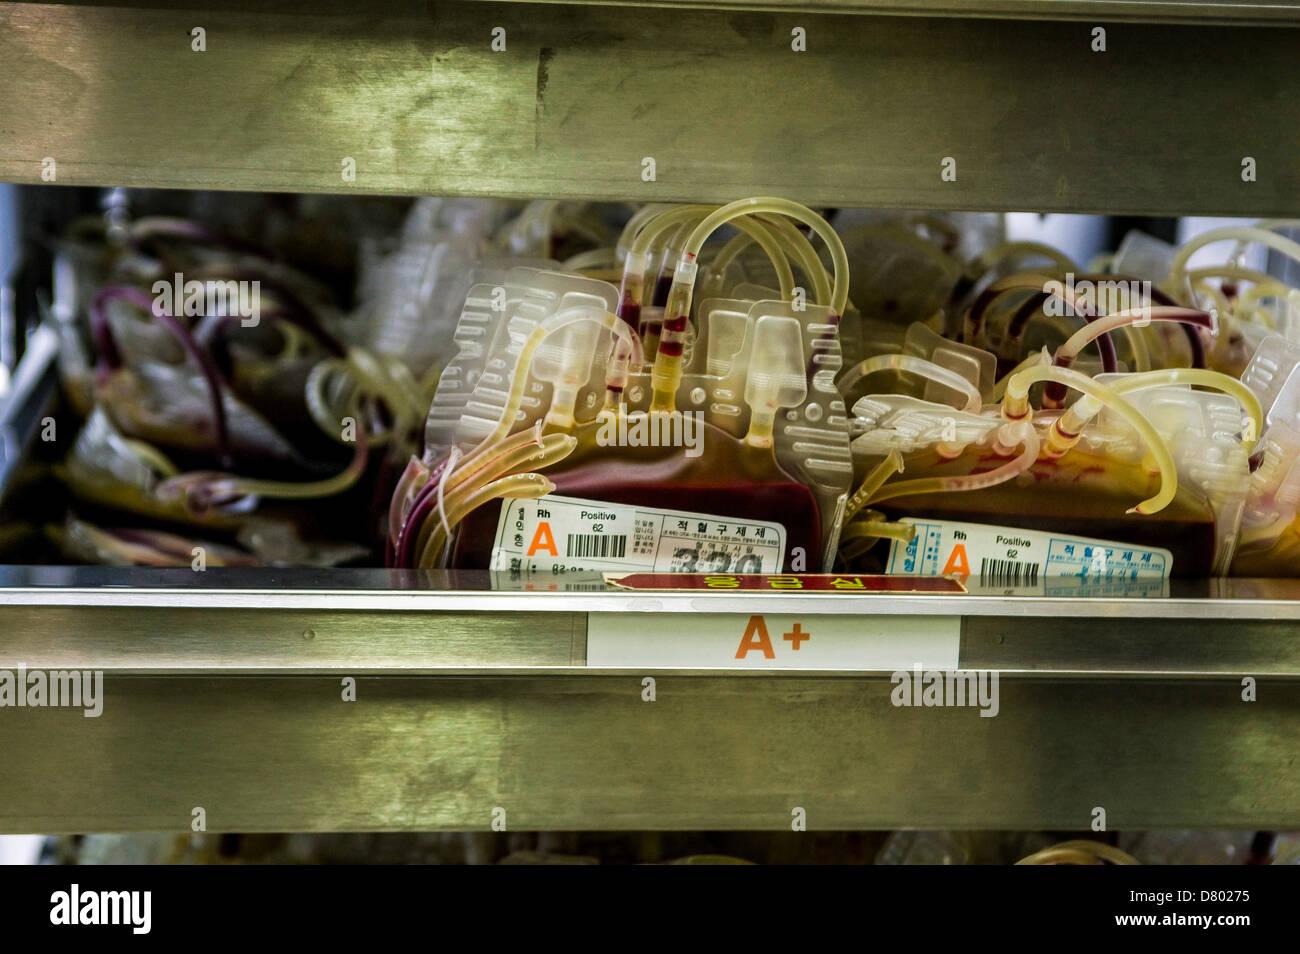 A+ Blood bag bank storage - Stock Image